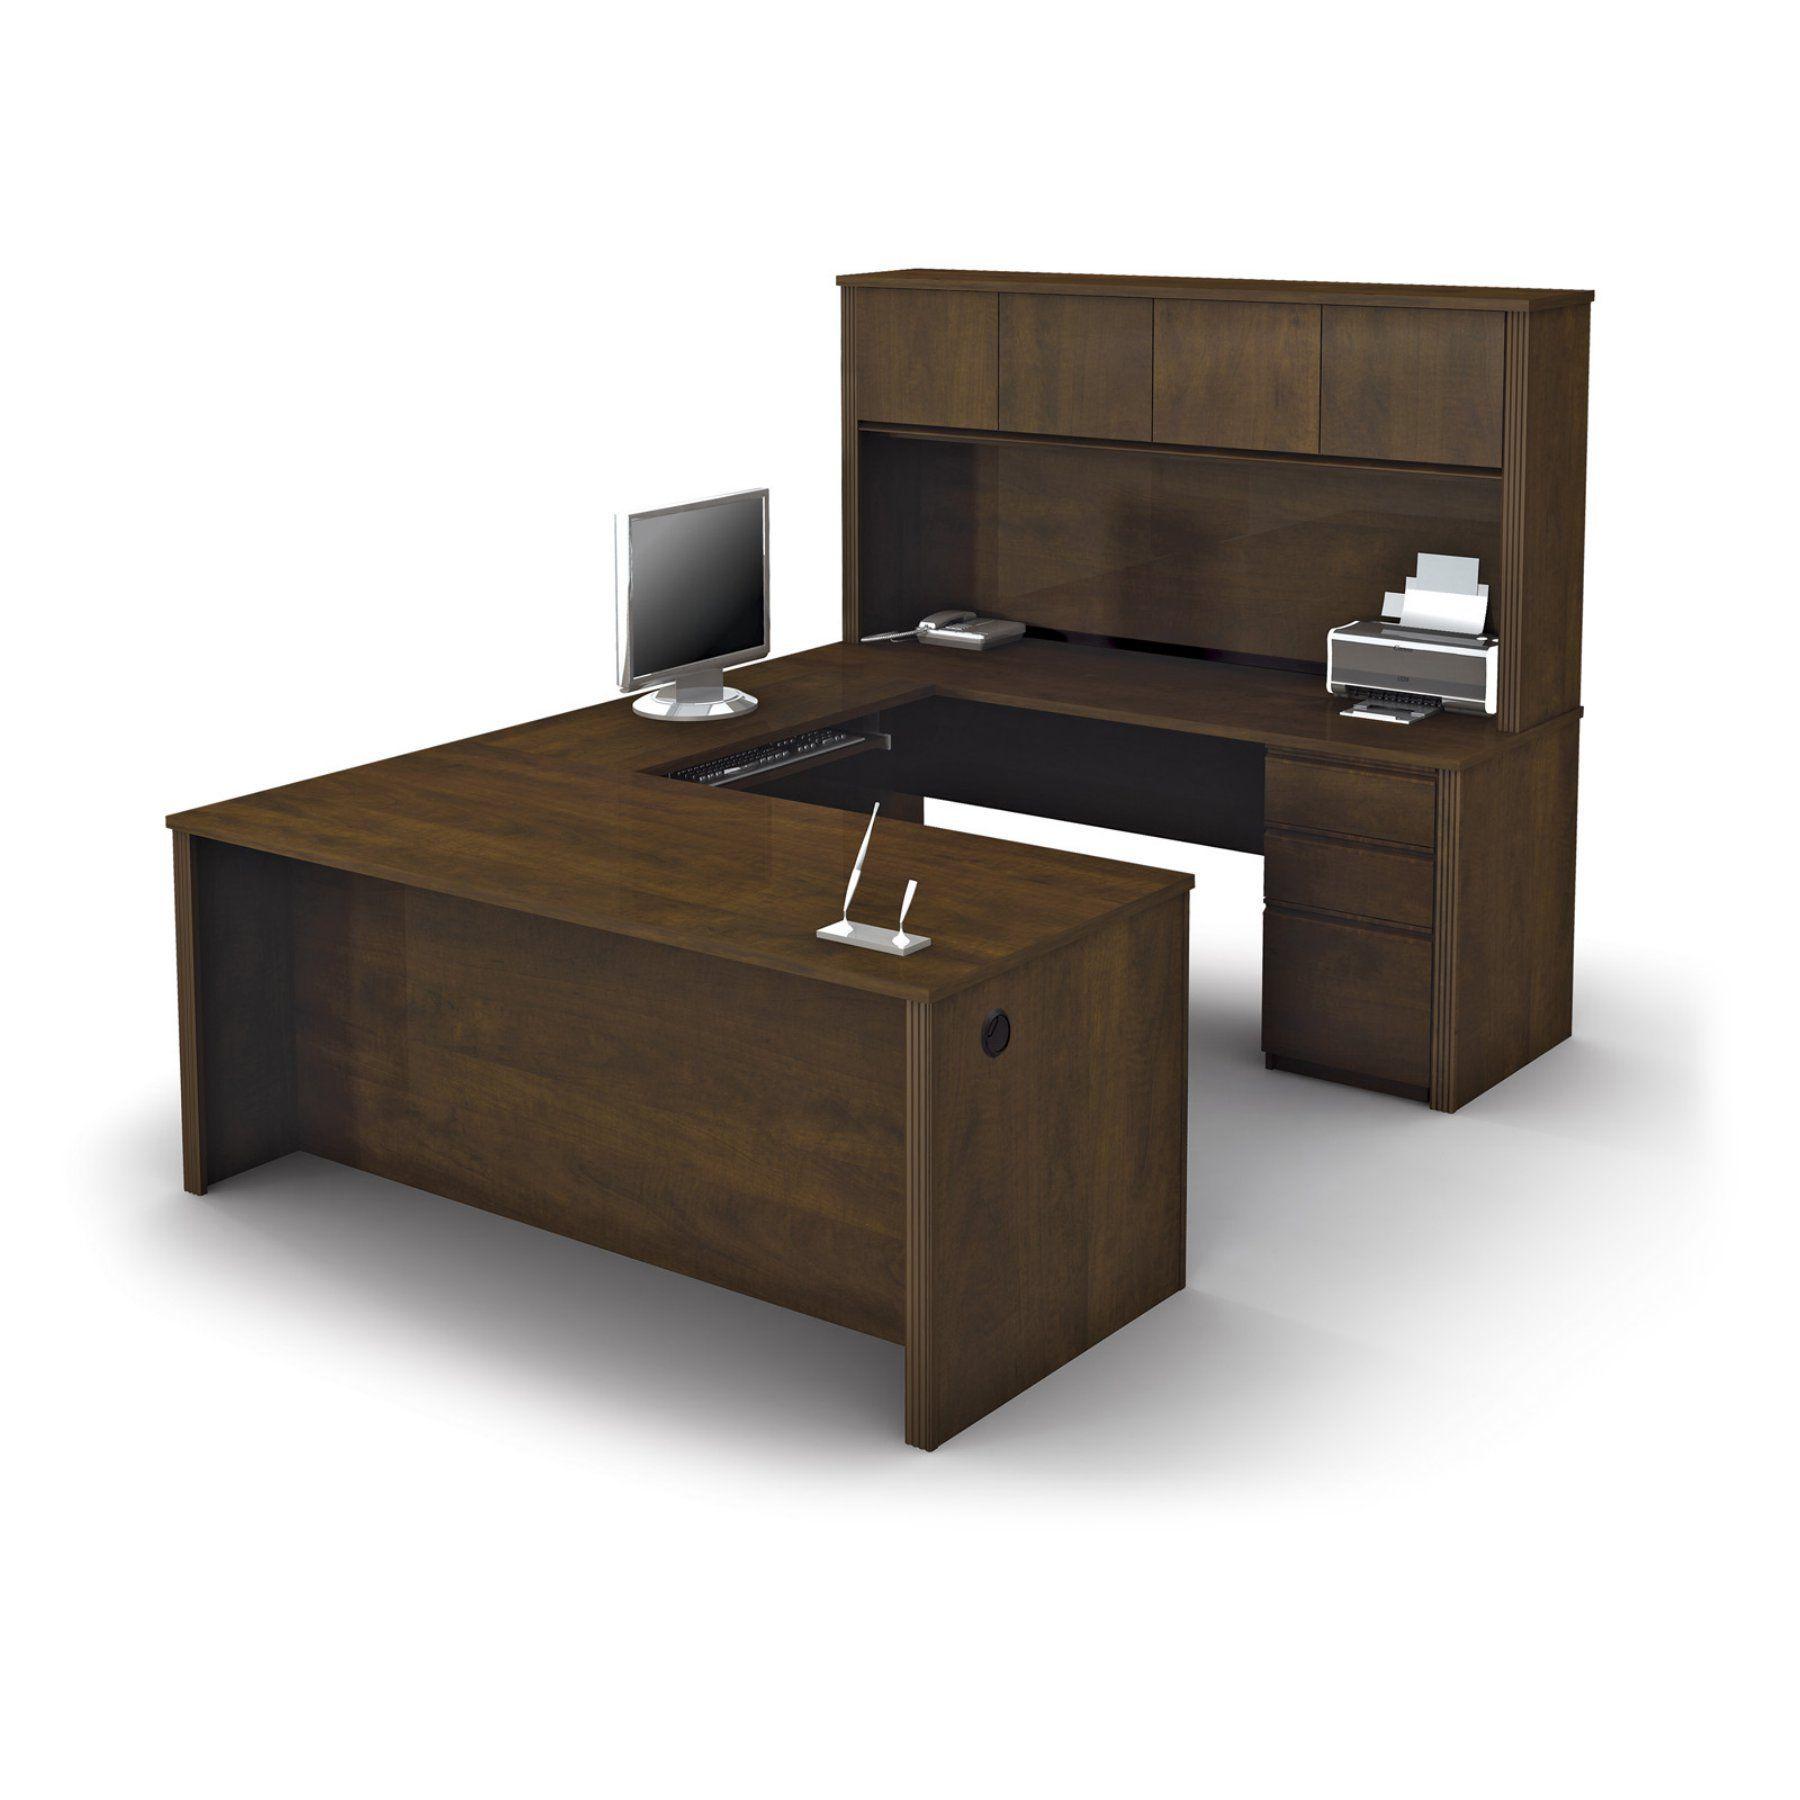 Bestar Prestige U-Shaped Workstation - Chocolate - 99853-69